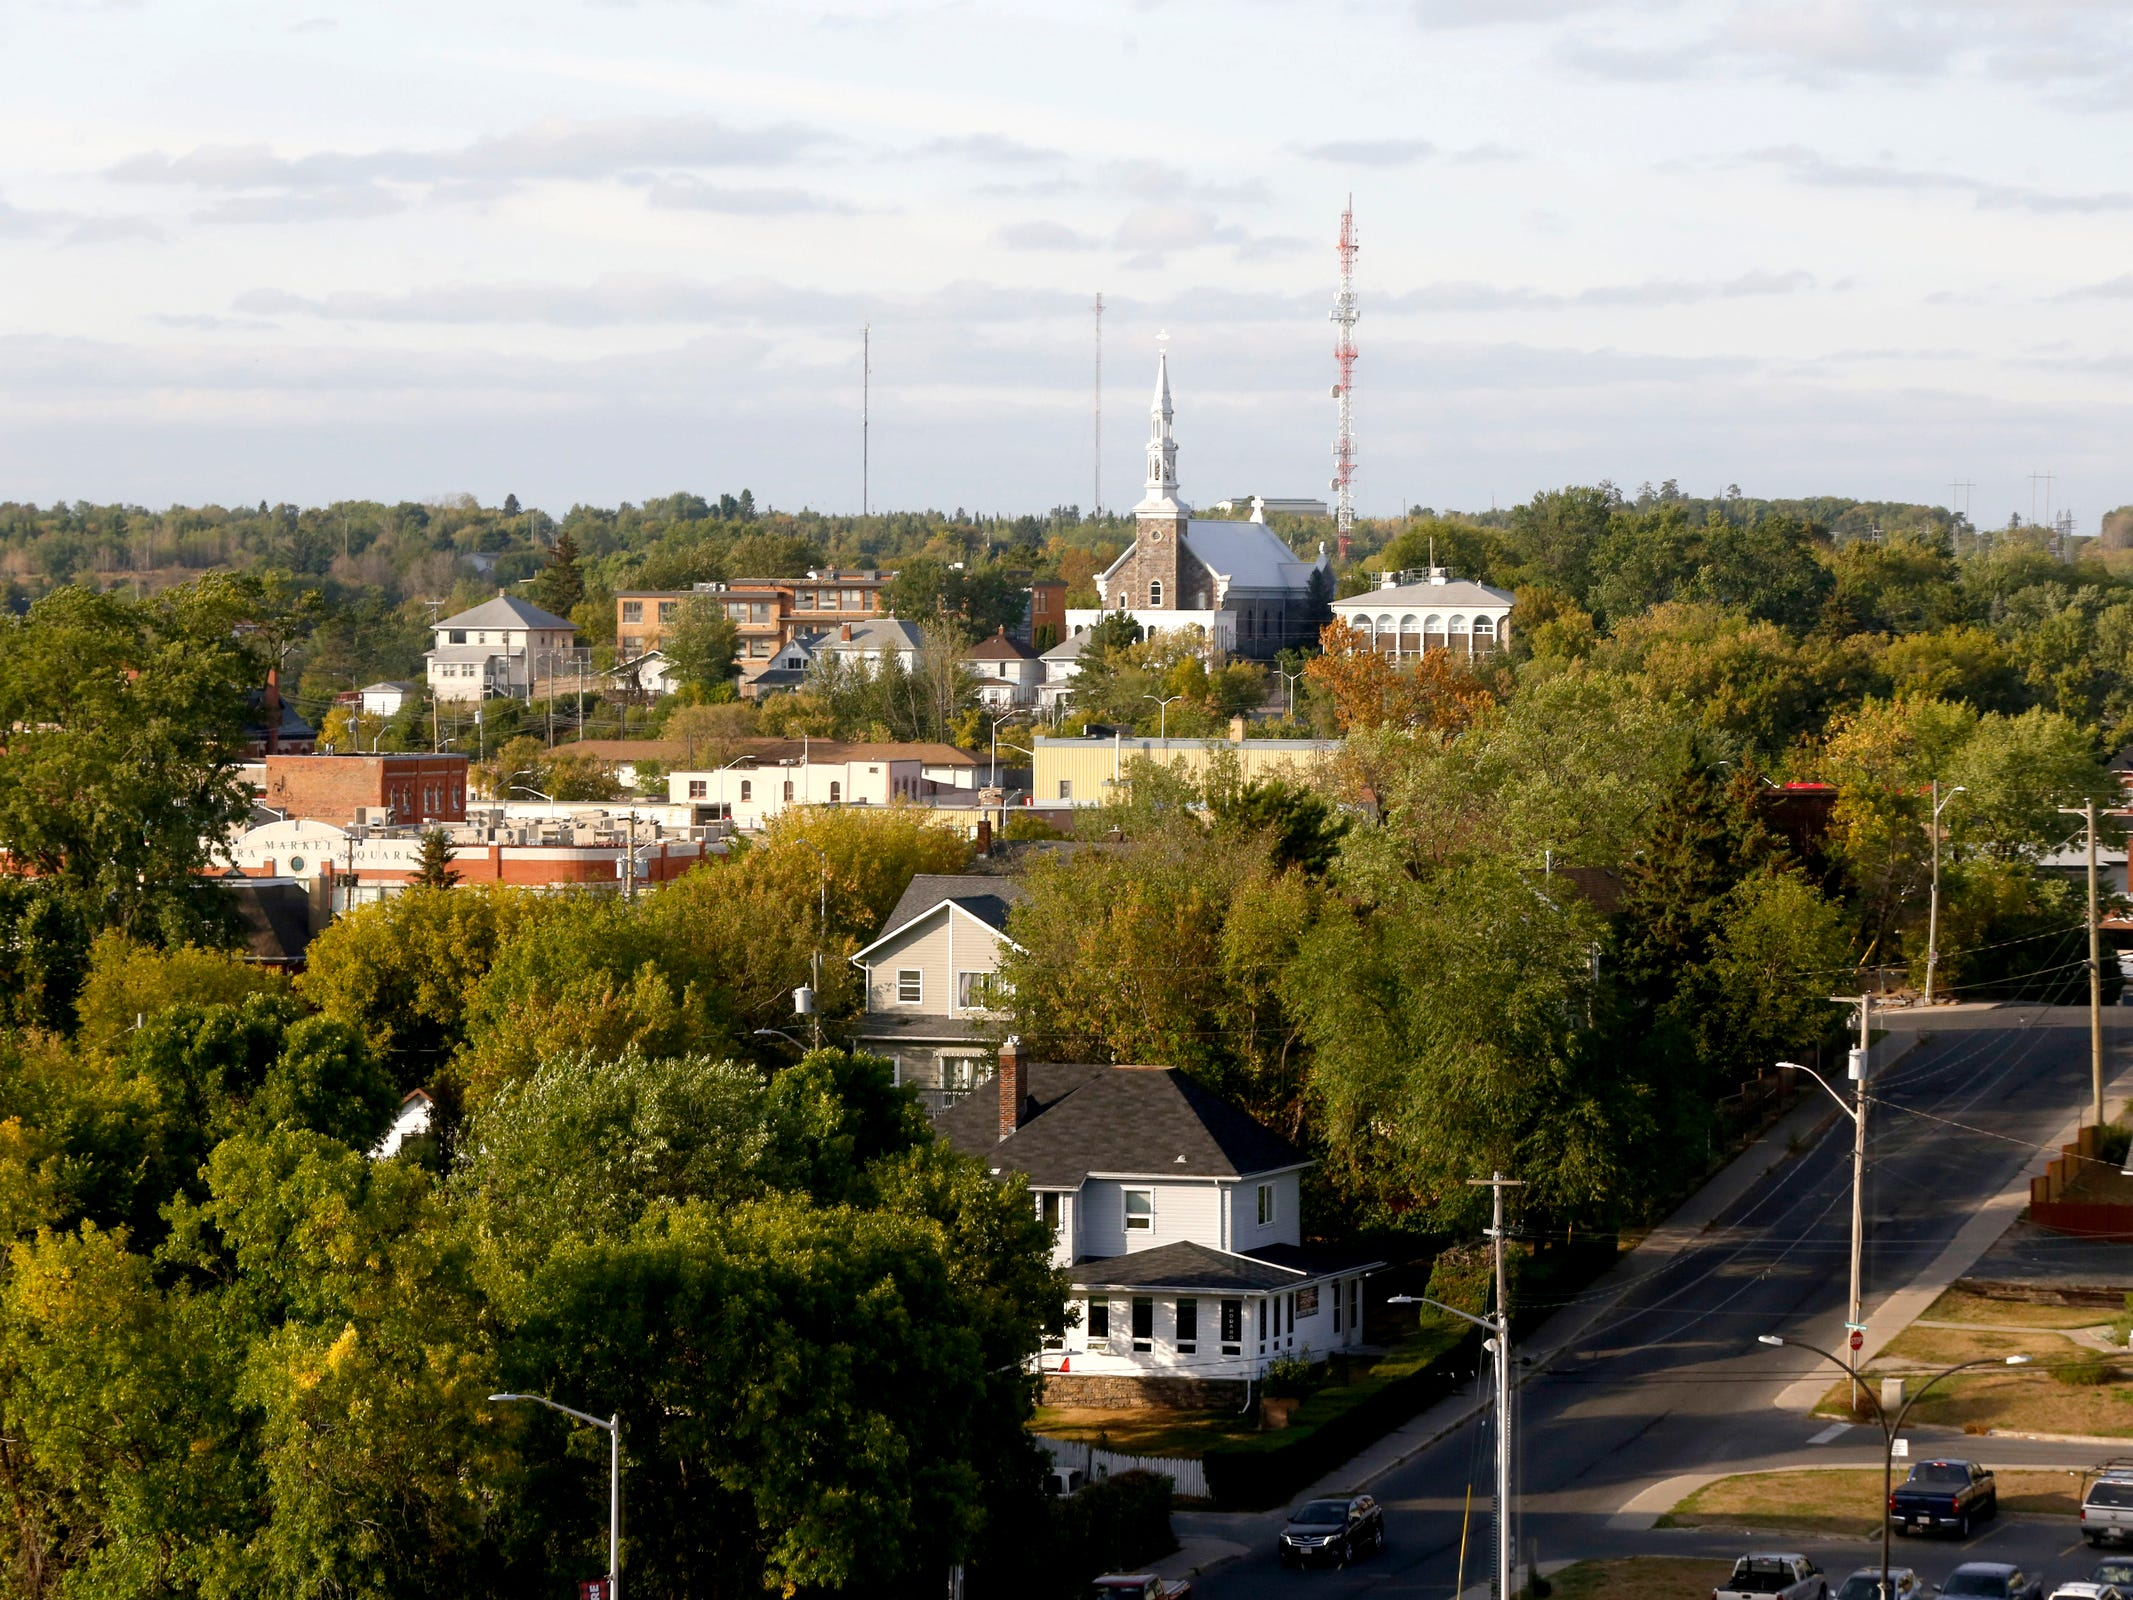 Joe Murphy has been living in the small town of Kenora, Ontario, Canada.